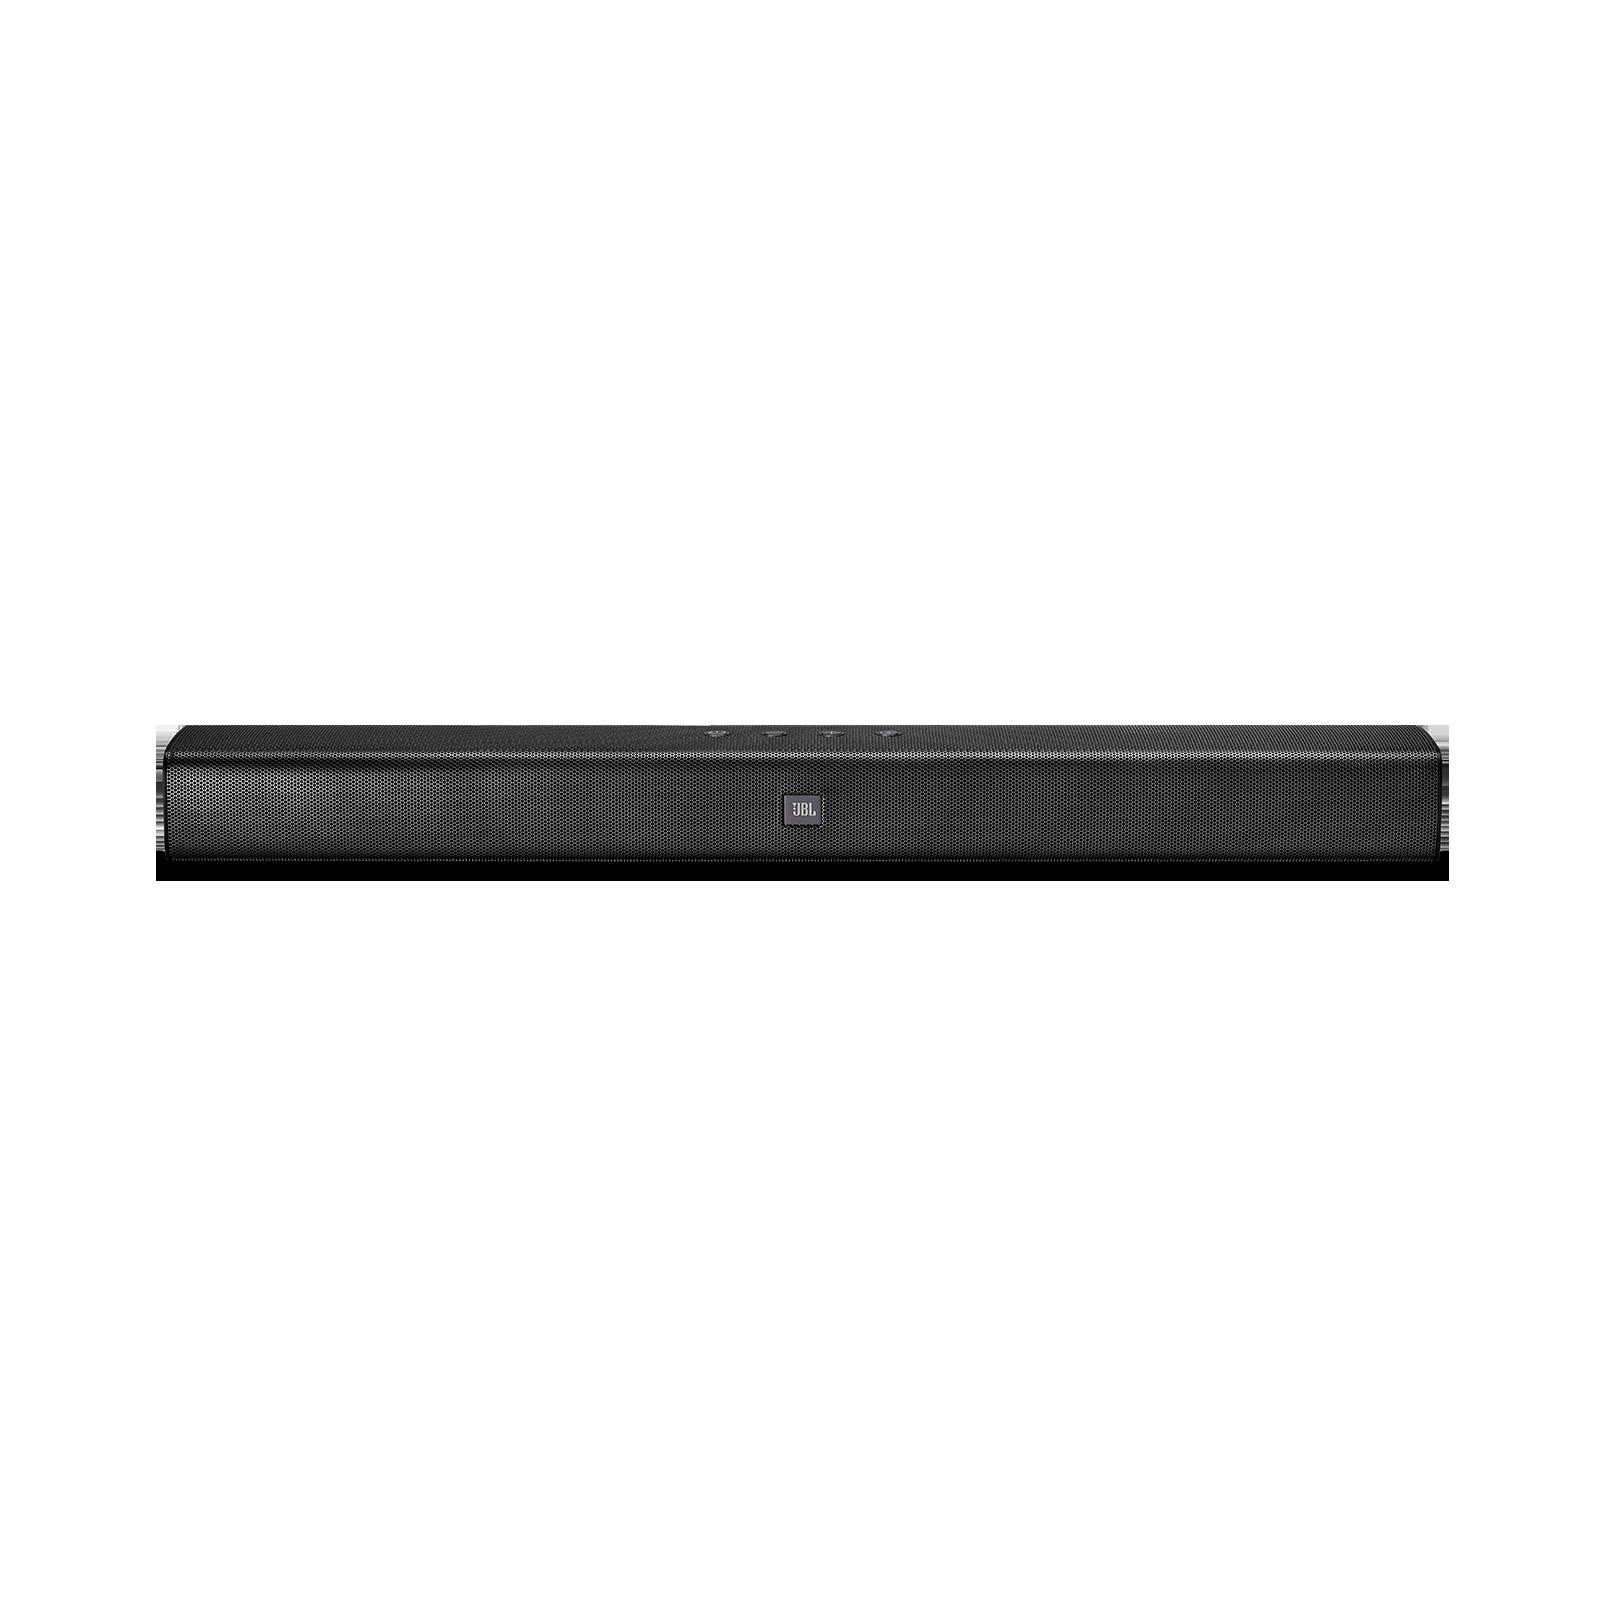 JBL Bar Studio - Black - 2.0 - Channel Soundbar with Bluetooth - Front